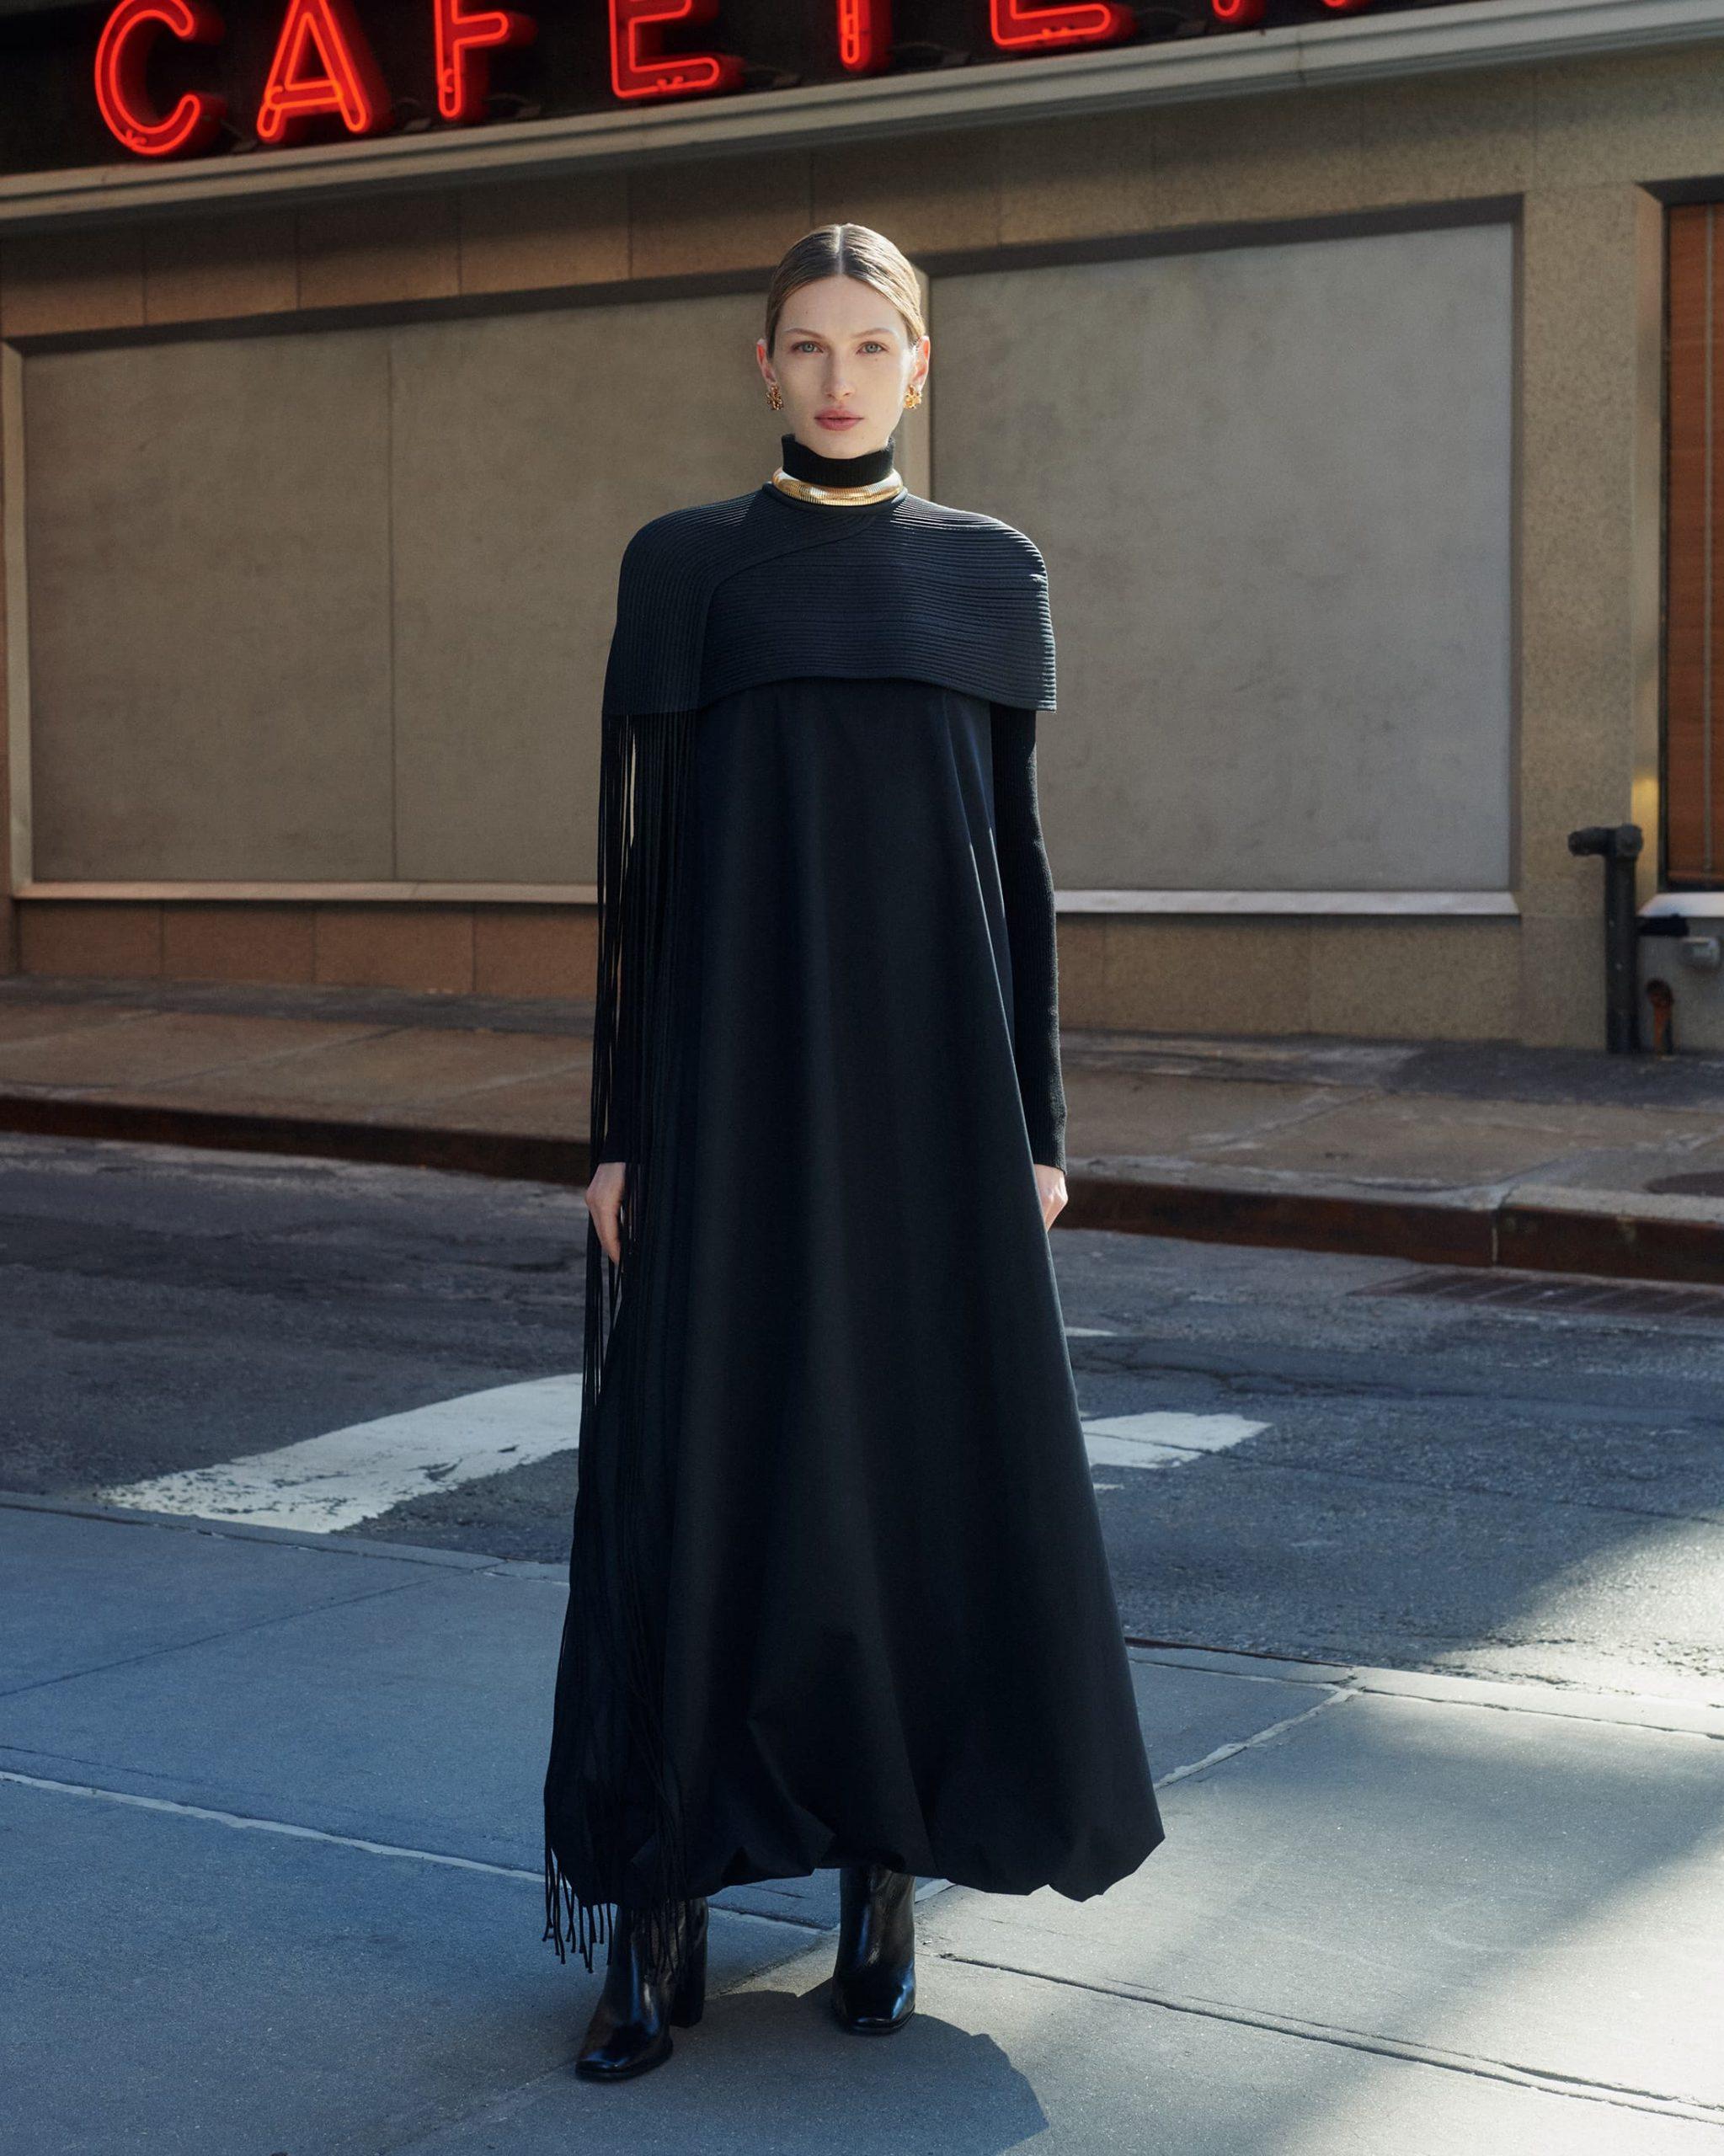 Tory Burch Fall 2021 Fashion Show Photos